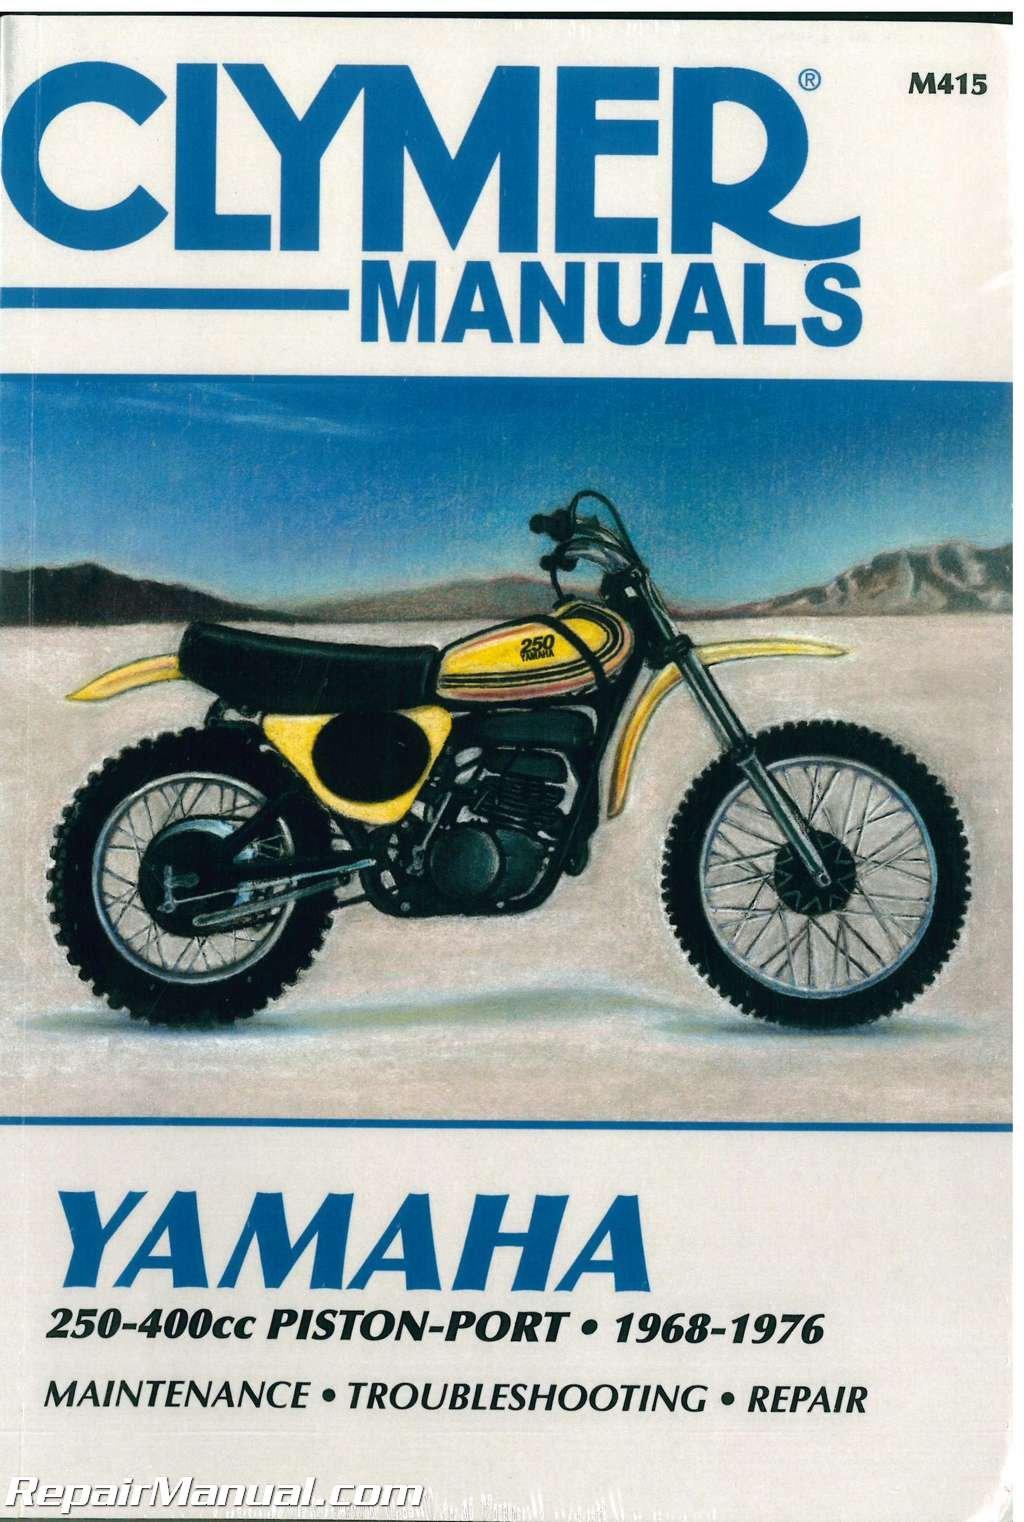 m415 1968-1976 yamaha 250-400cc piston port clymer motorcycle repair manual  paperback – 2004